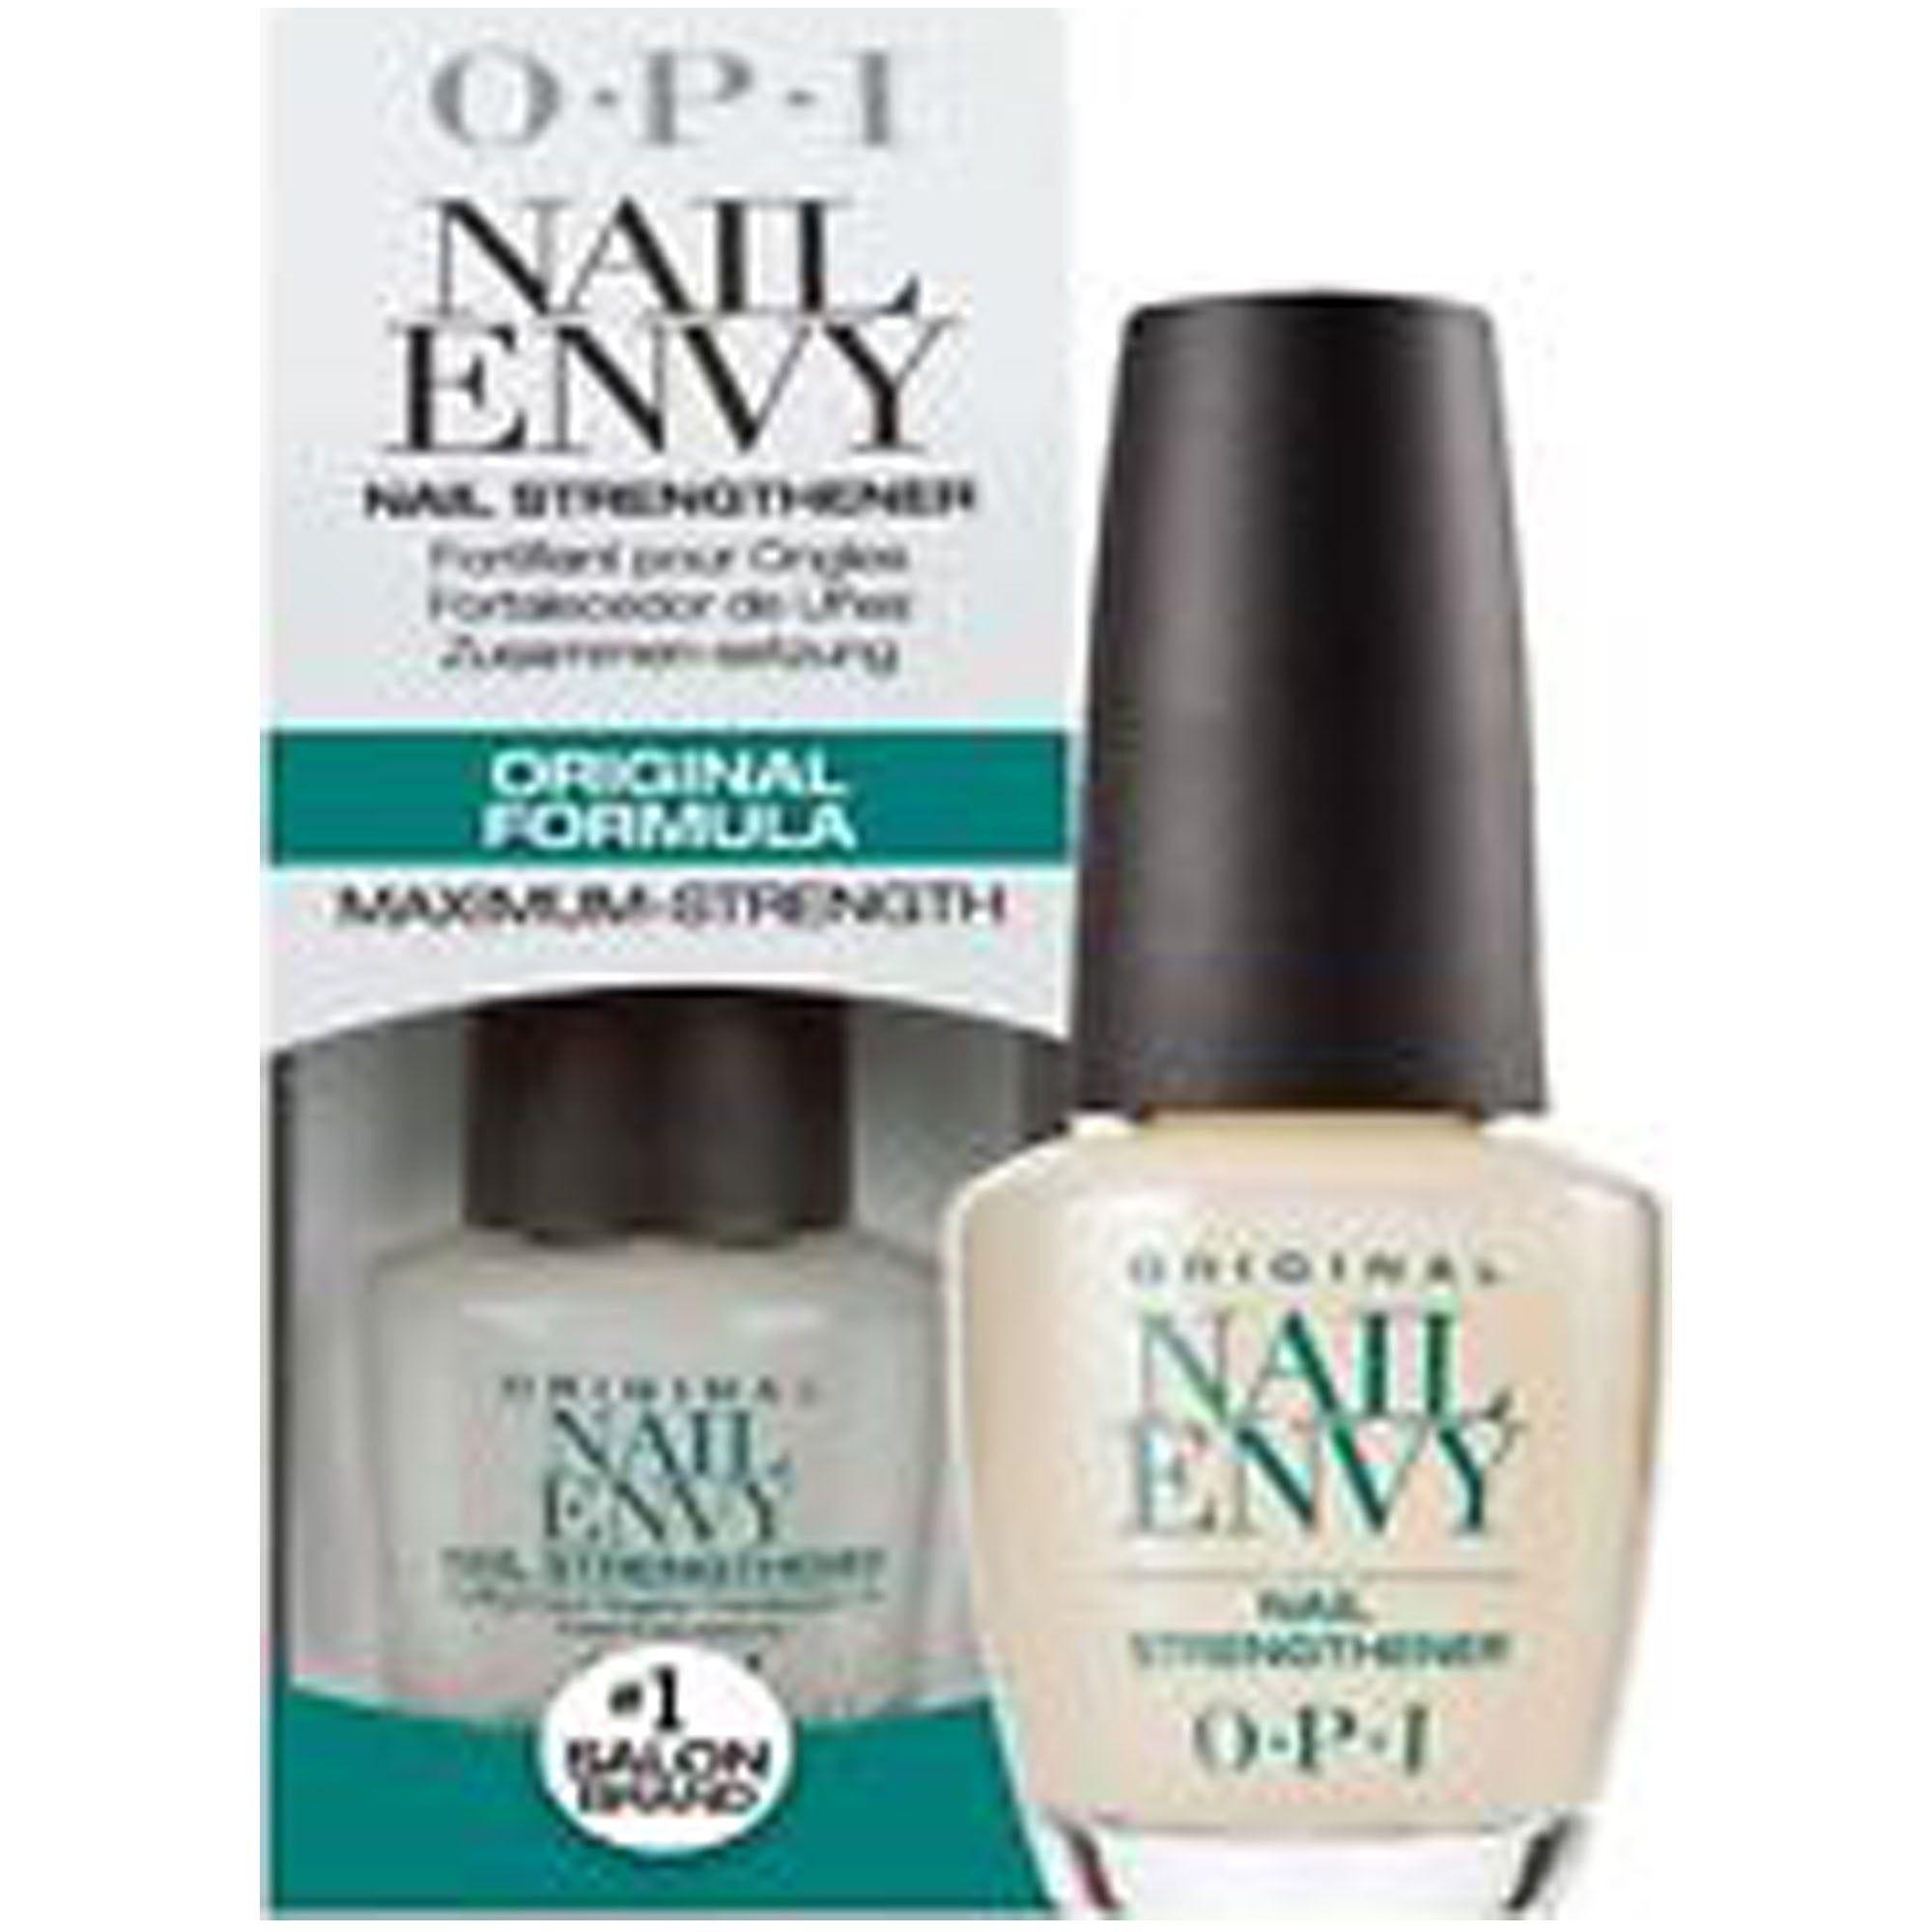 OPI Nail Envy Nail Strengthener Original Formula 15mL | Quality UK ...